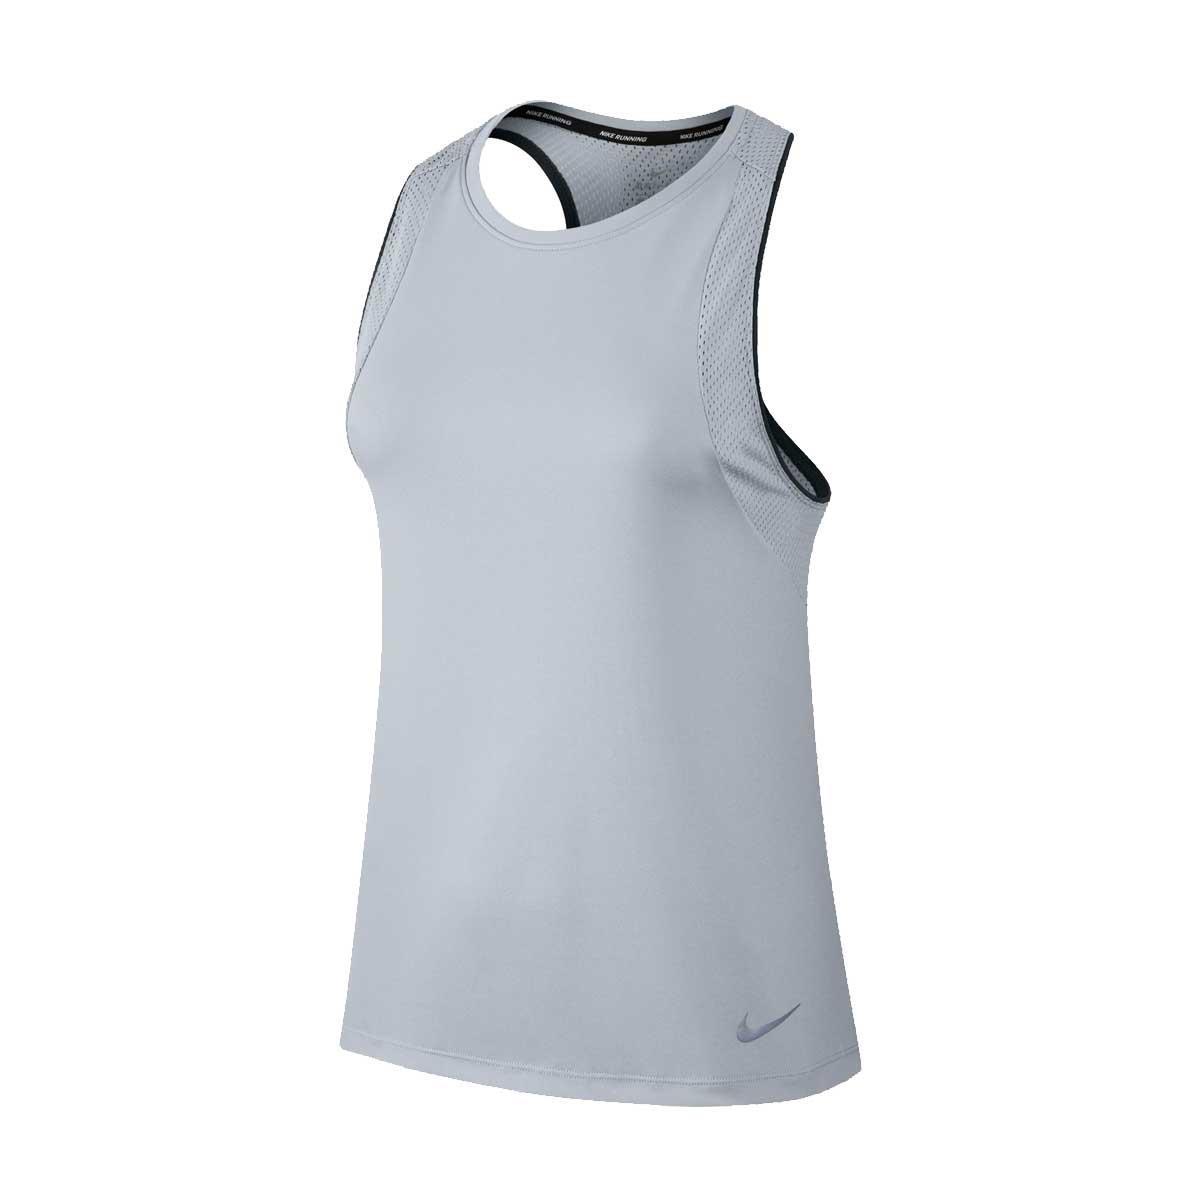 Camiseta Regata Nike Dry Miler Cool Feminino 195543c3482